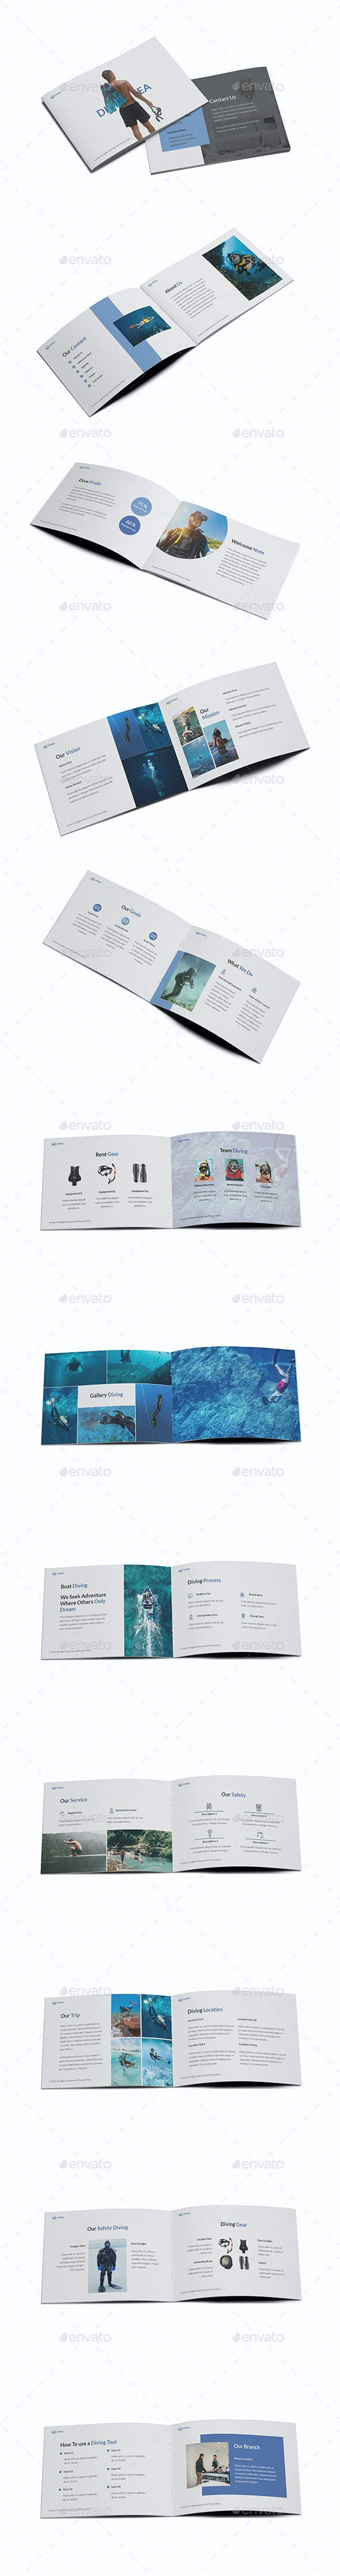 Diving School A5 Brochure Template - Brochures Print